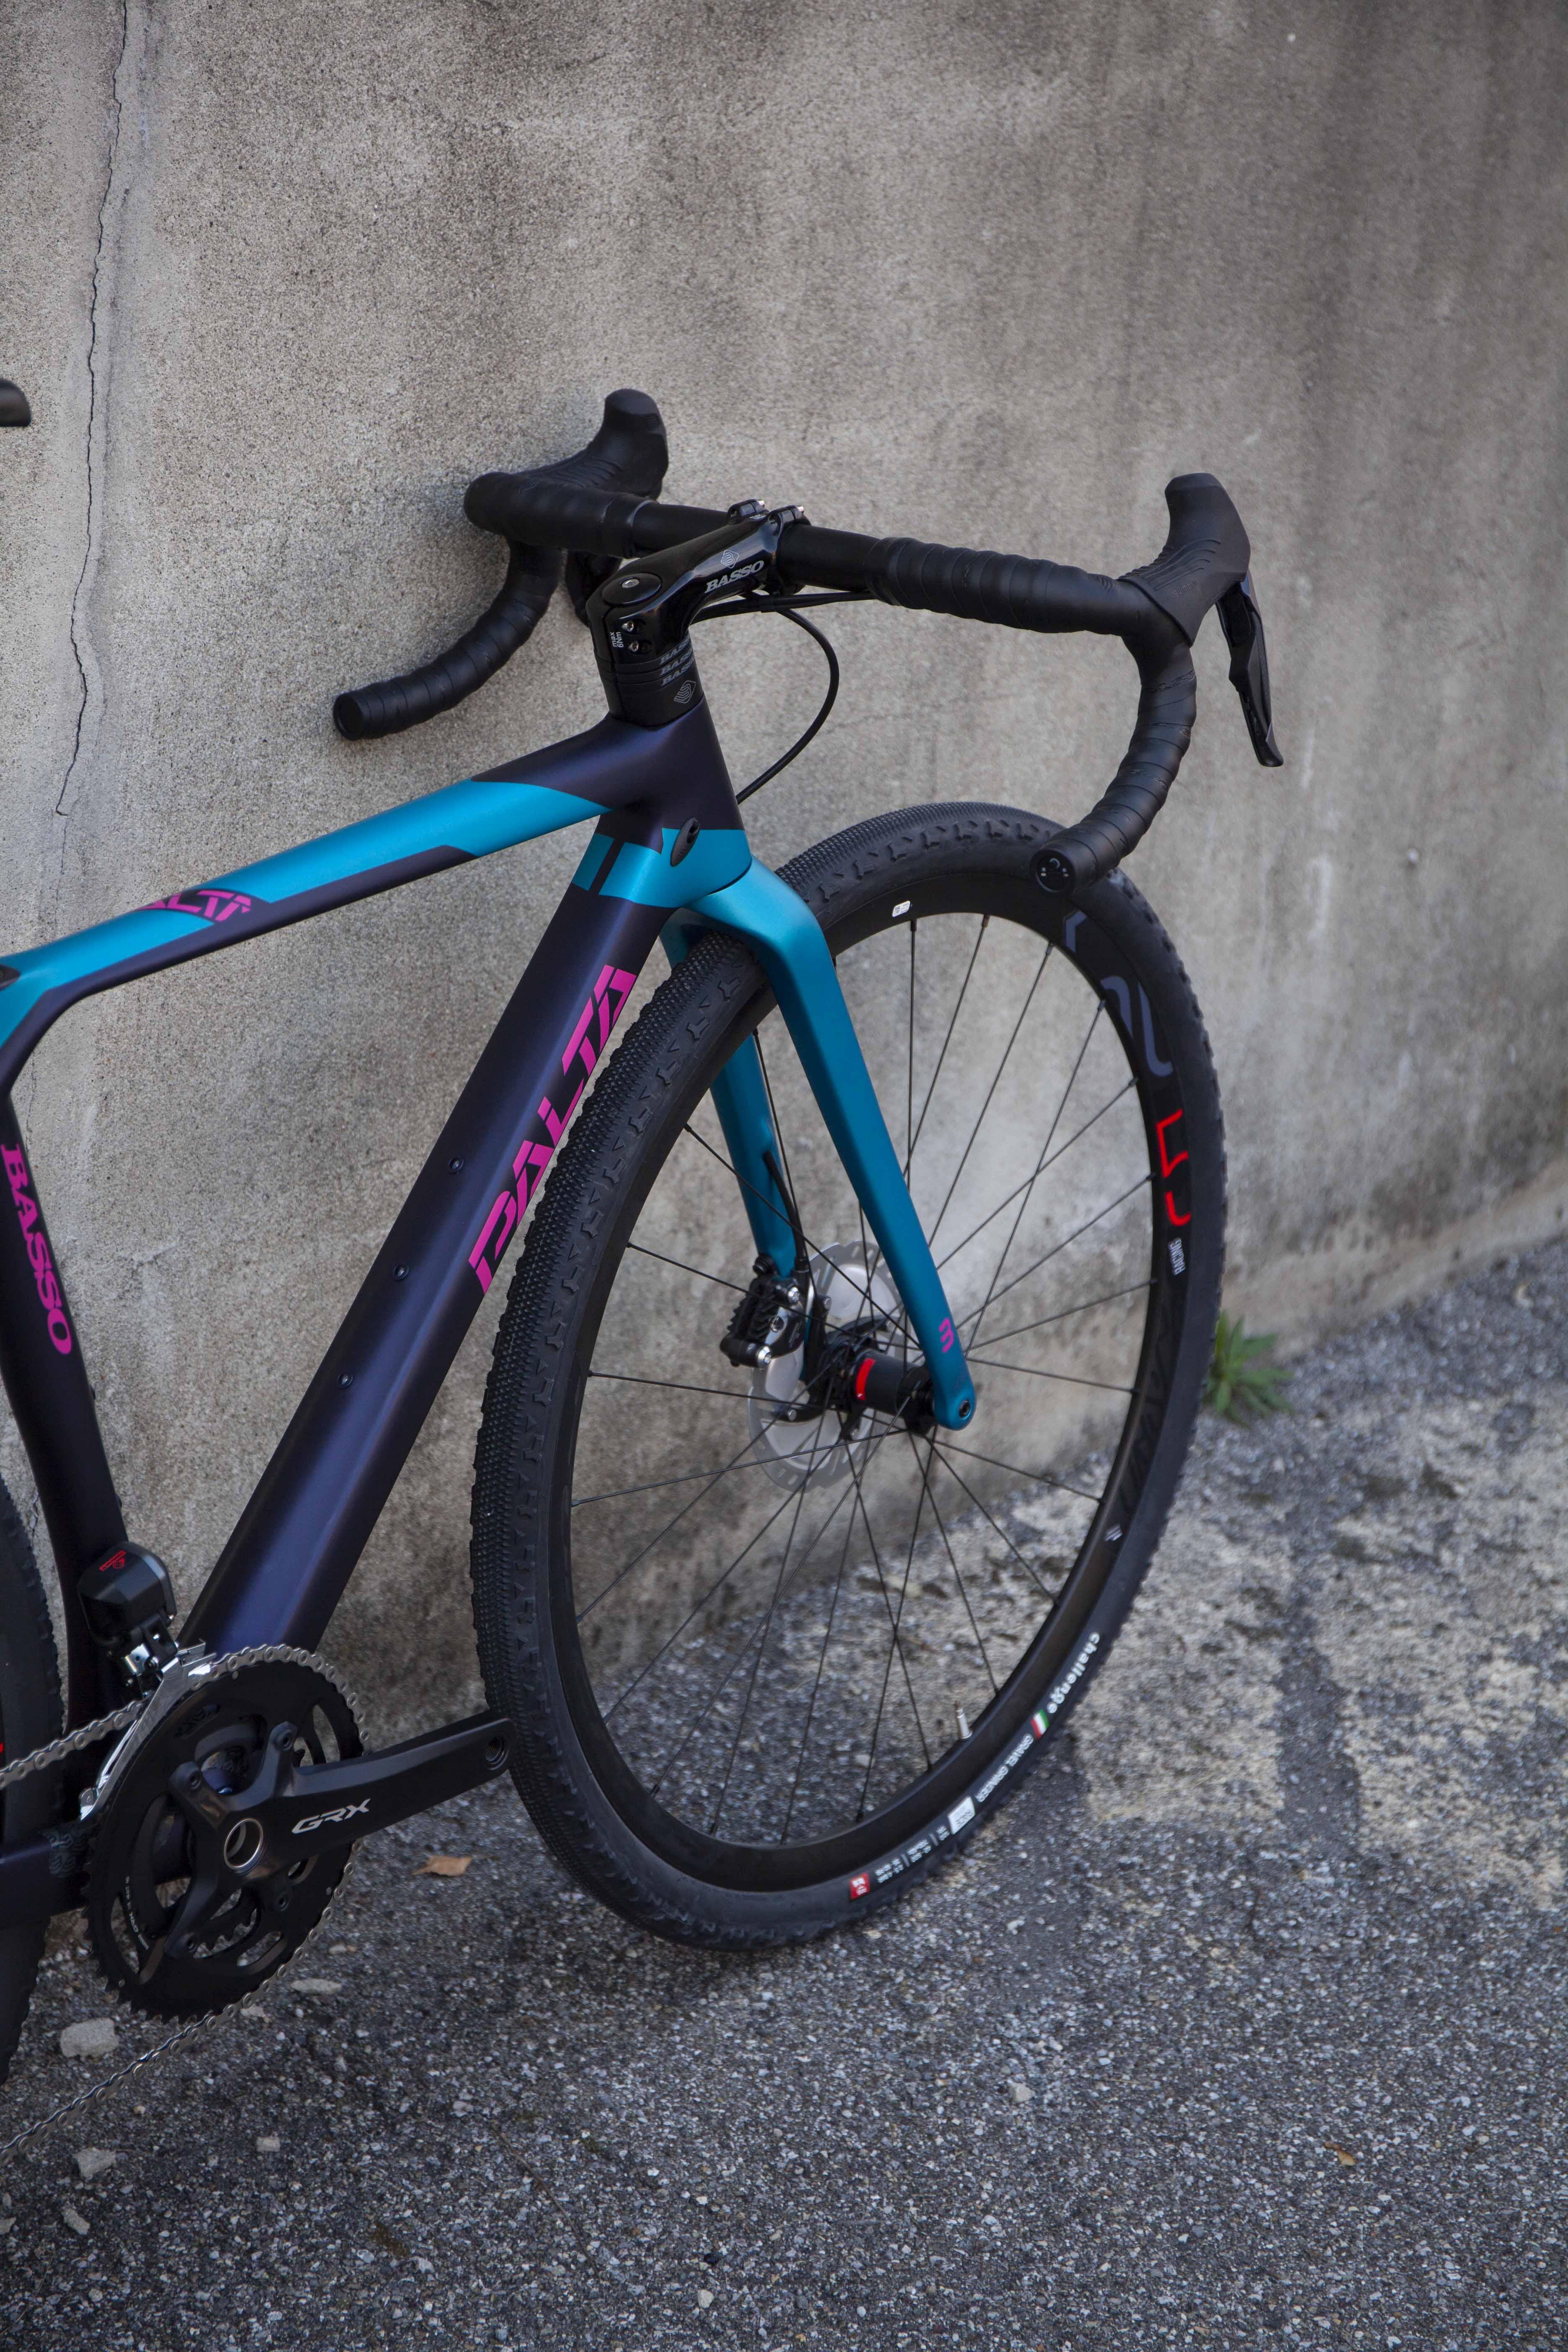 Cicli Corsa Basso Palta purple G grx_6Cicli Corsa Basso Palta purple G grx_6